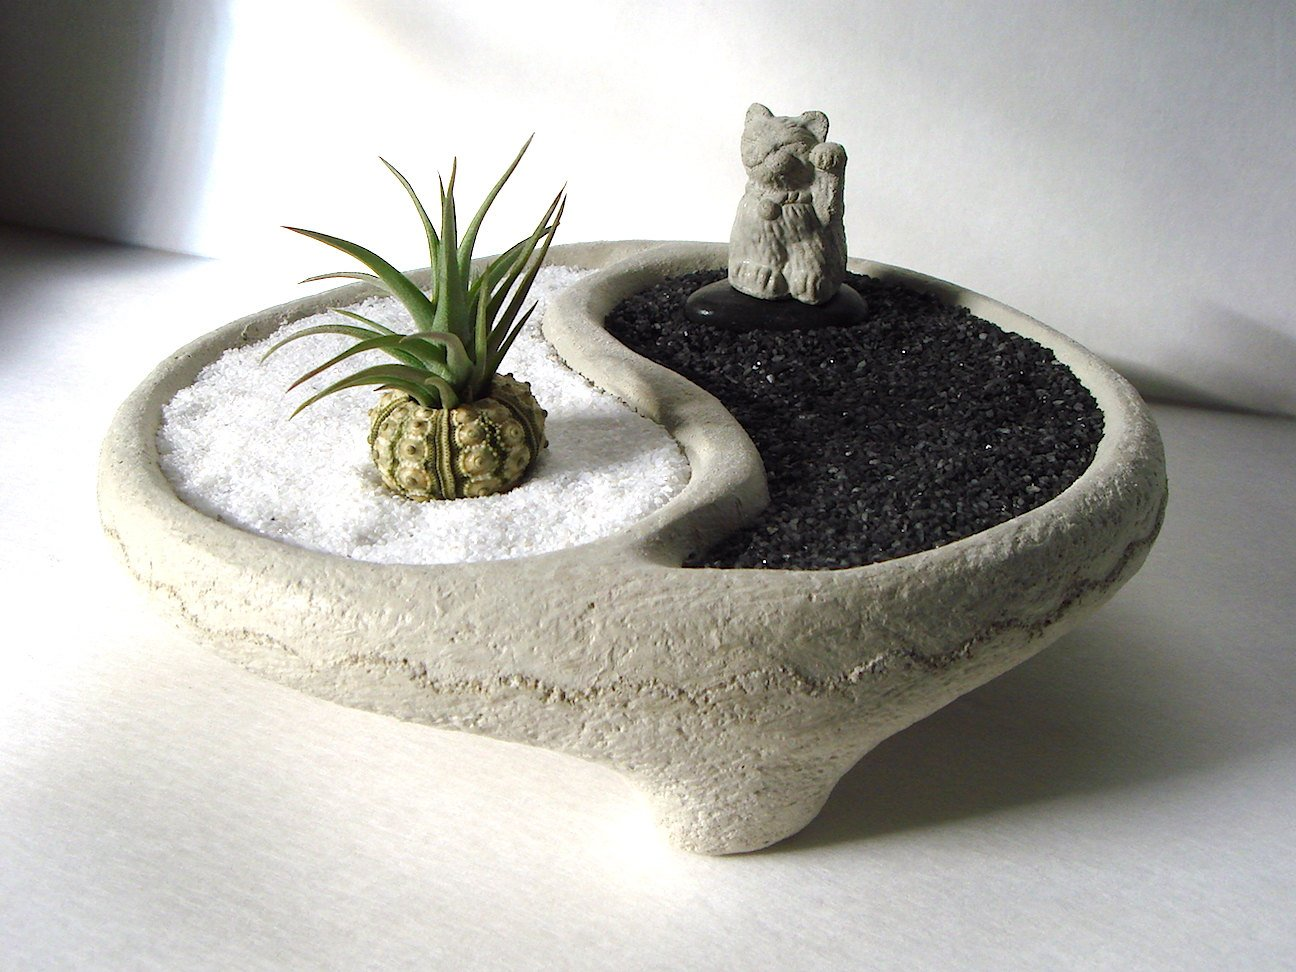 Yin Yang Stone Bowl + Micro Lucky Cat Maneki Neko + Air Plant Zen Garden